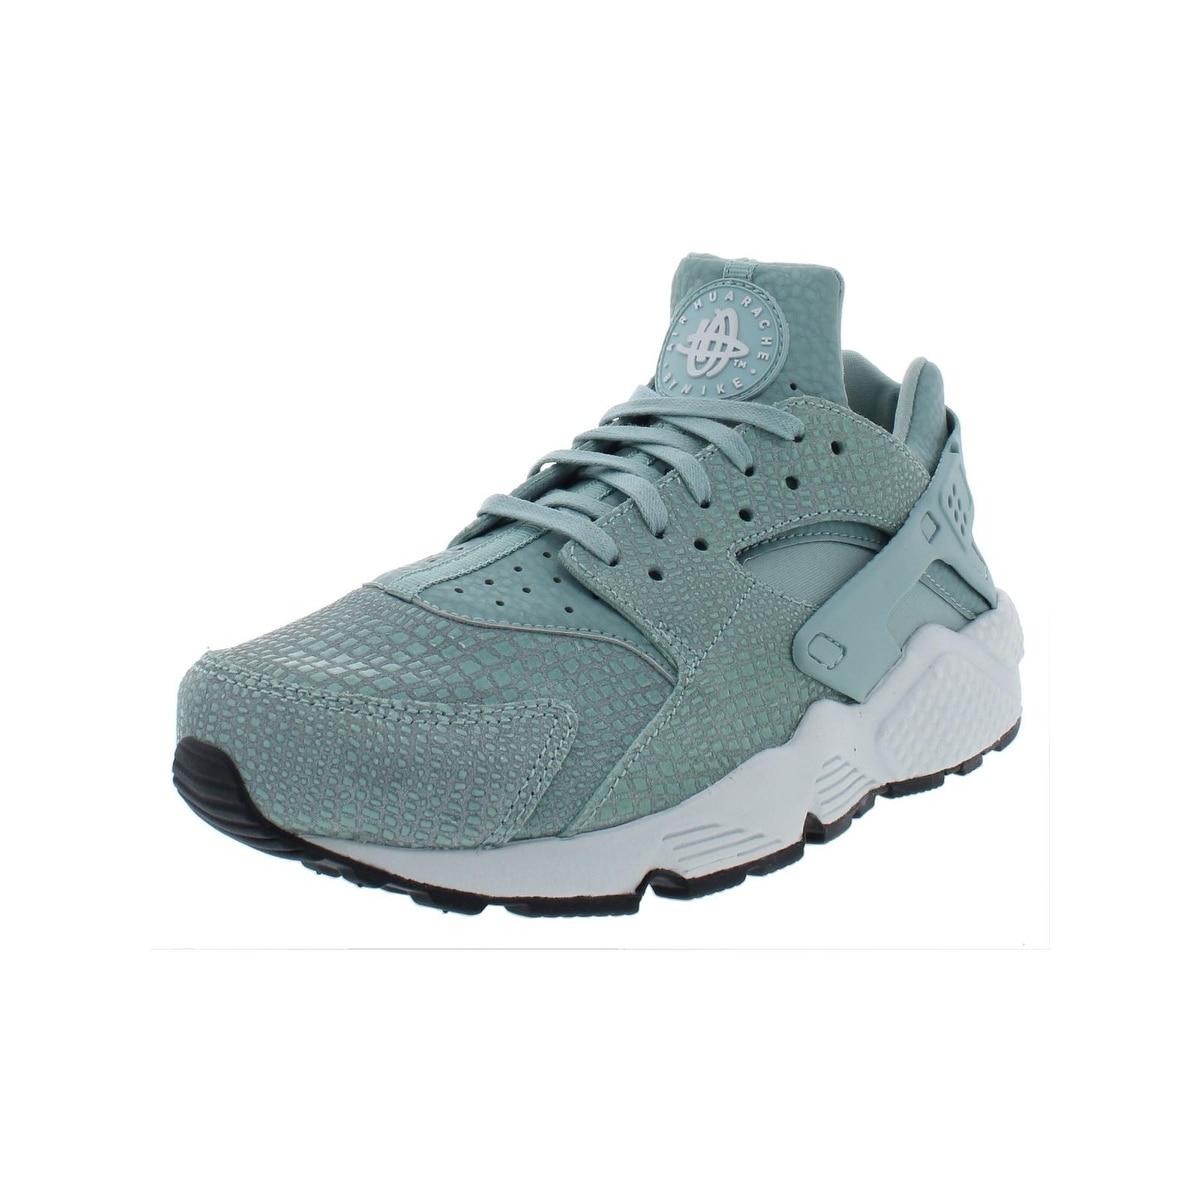 Nike Womens Air Huarache Run Print Athletic Shoes Running Workout